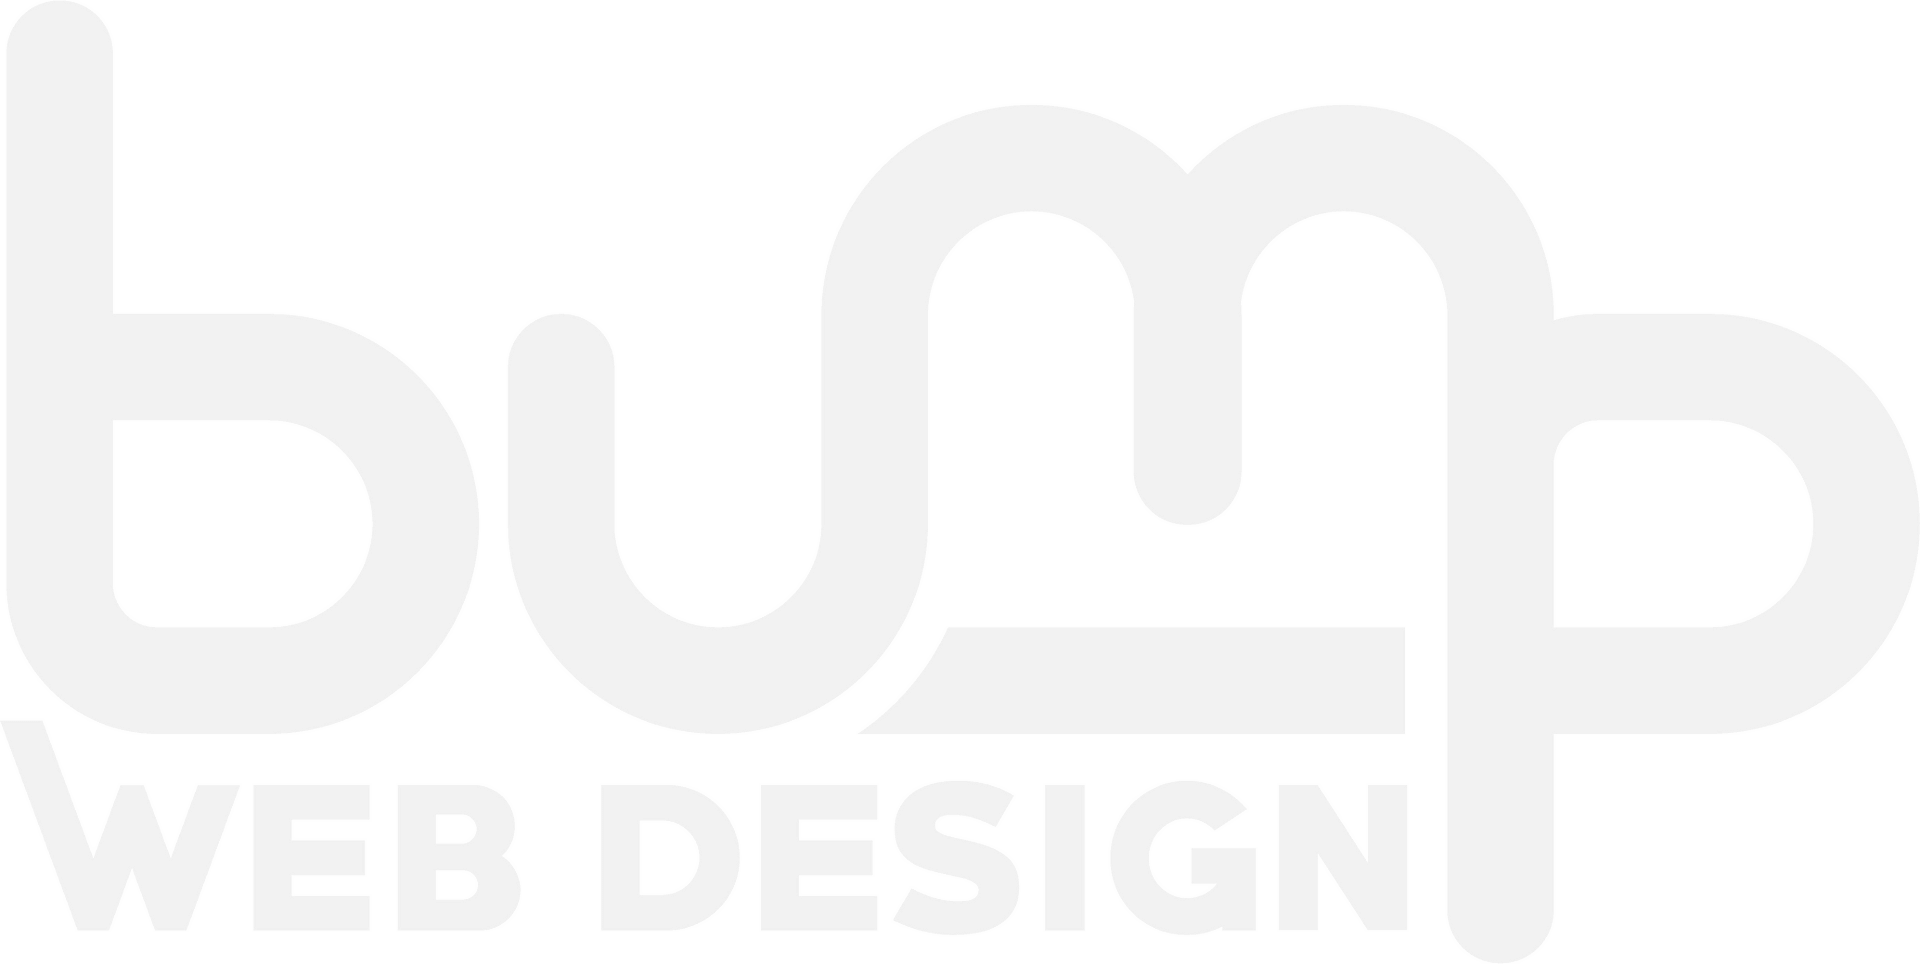 FREE Web Design for Small Businesses | Bump Web Design